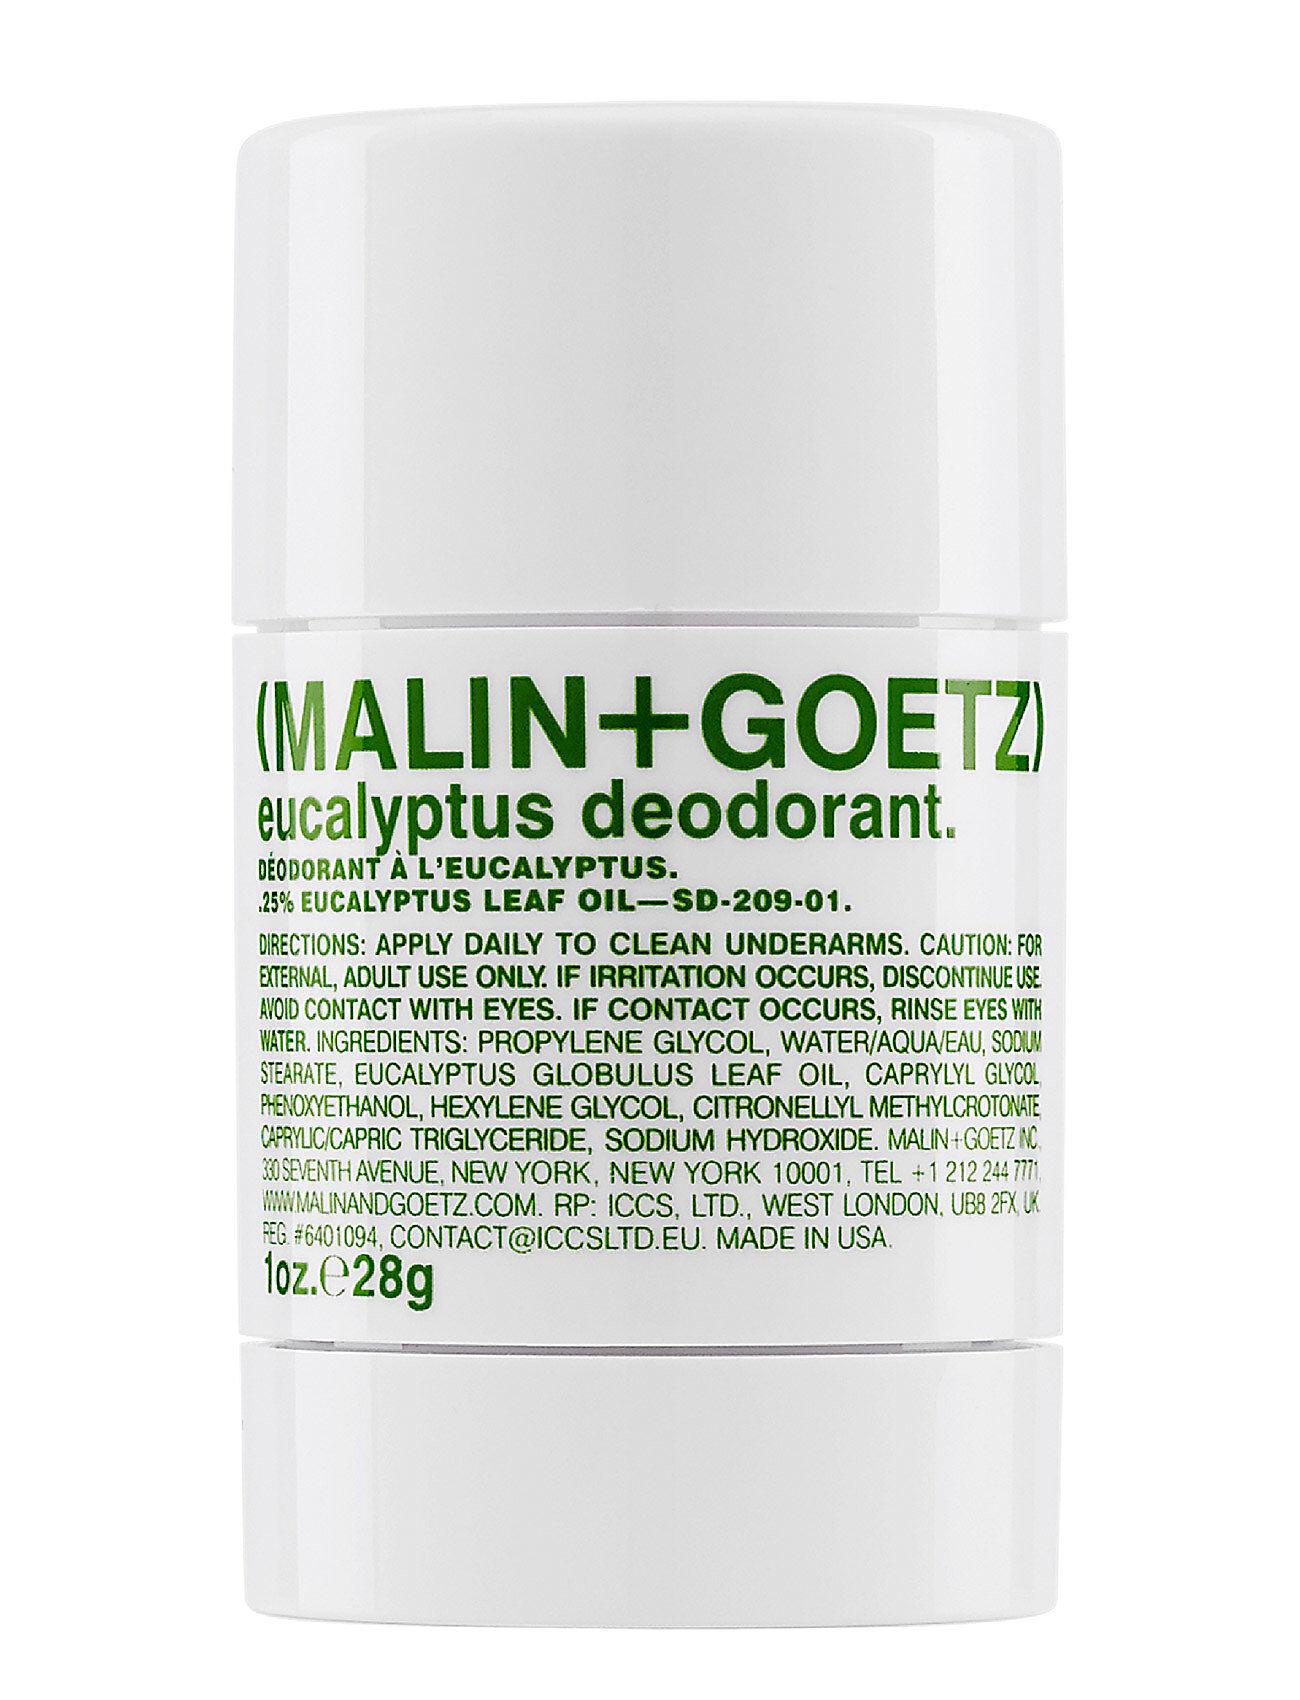 Malin+Goetz Eucalyptus Deodorant Mini